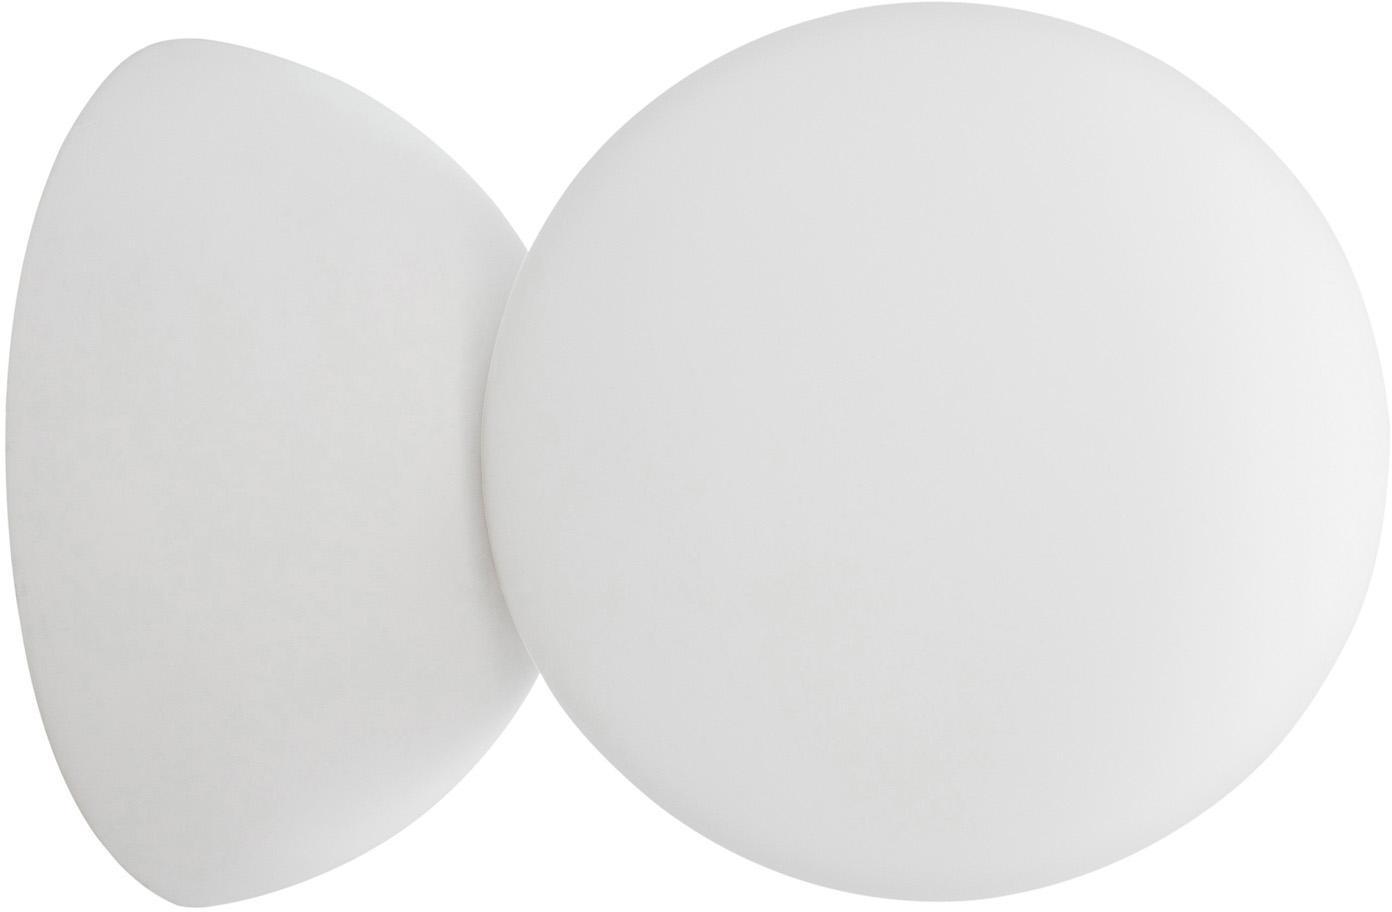 Wandleuchte Zero aus Opalglas, Lampenschirm: Opalglas, Weiß, Ø 10 x T 14 cm